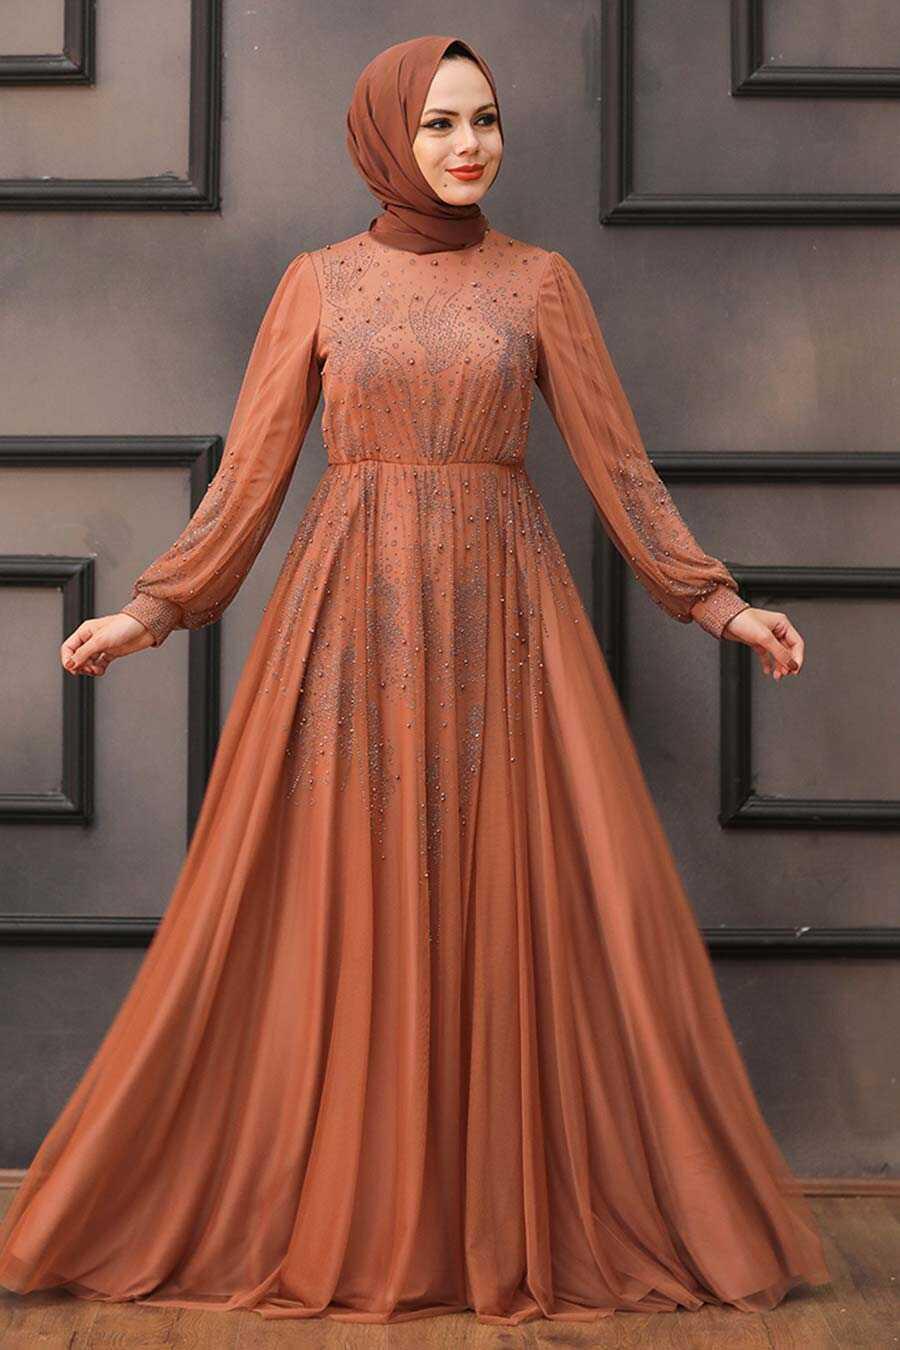 Terra Cotta Hijab Evening Dress 22031KRMT